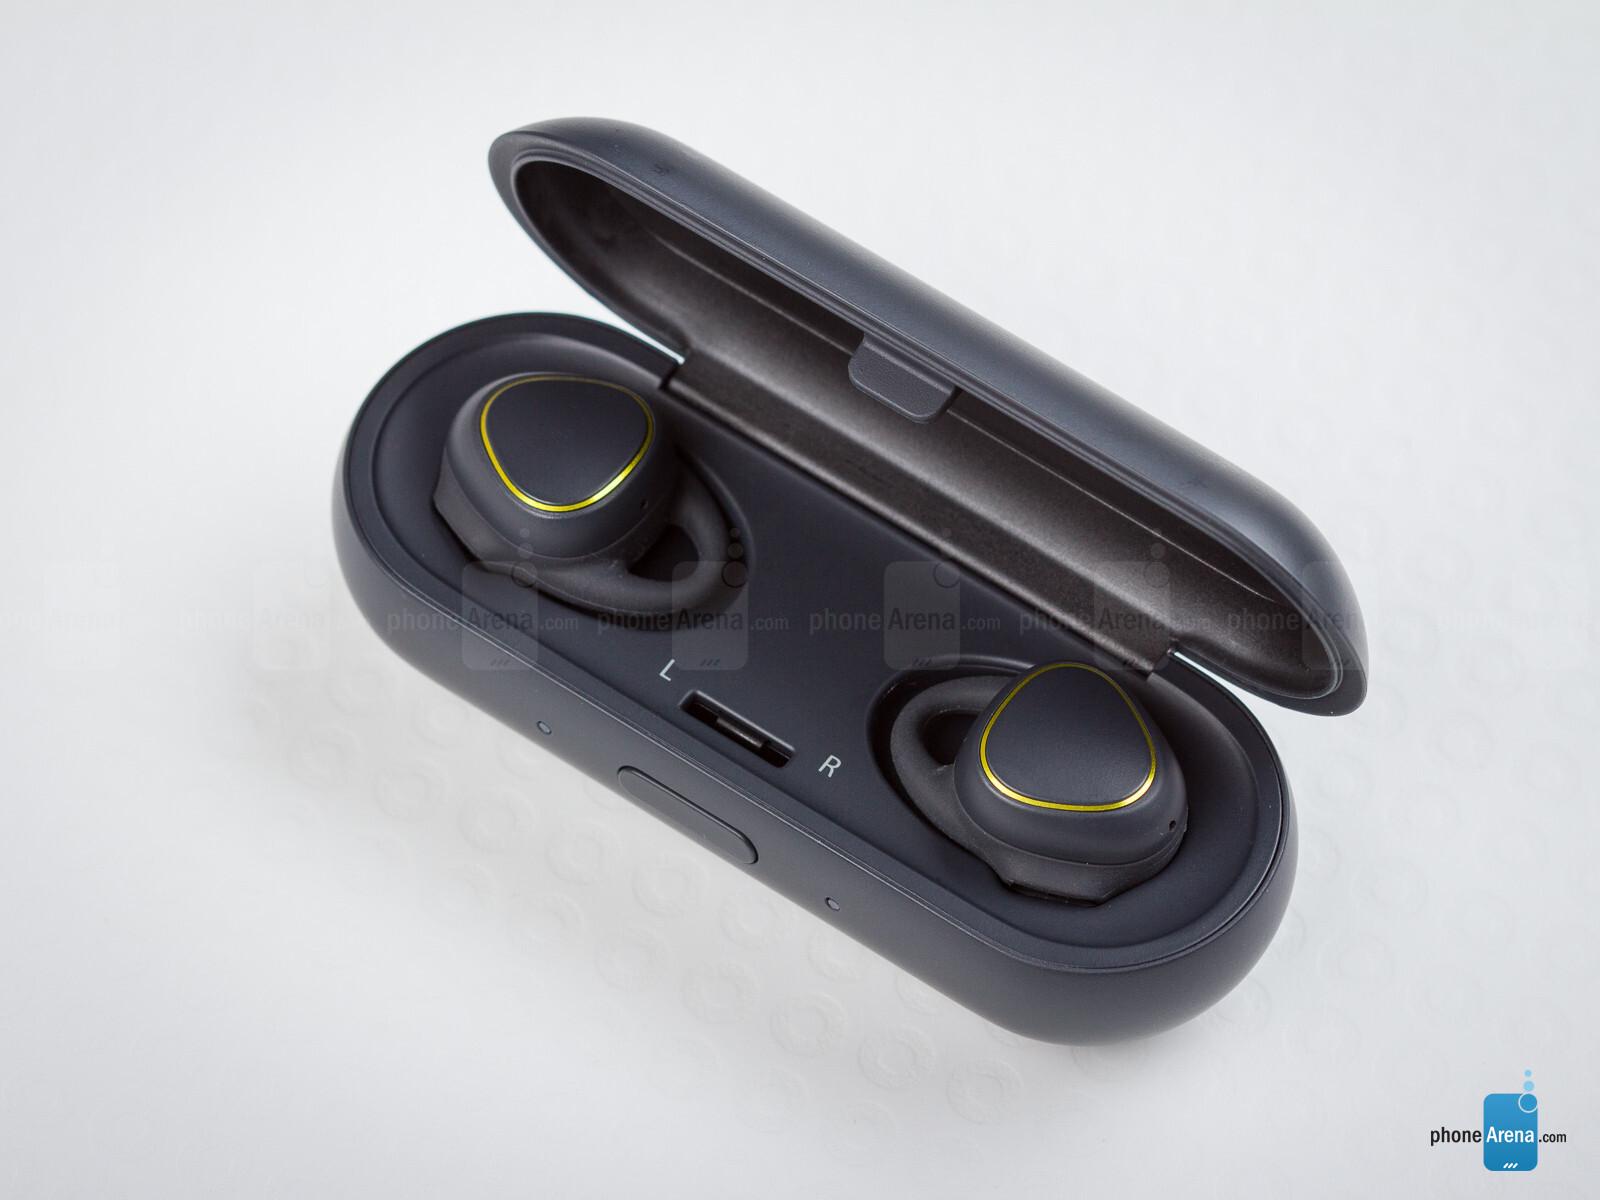 Samsung Gear Iconx Wireless Earphones Review